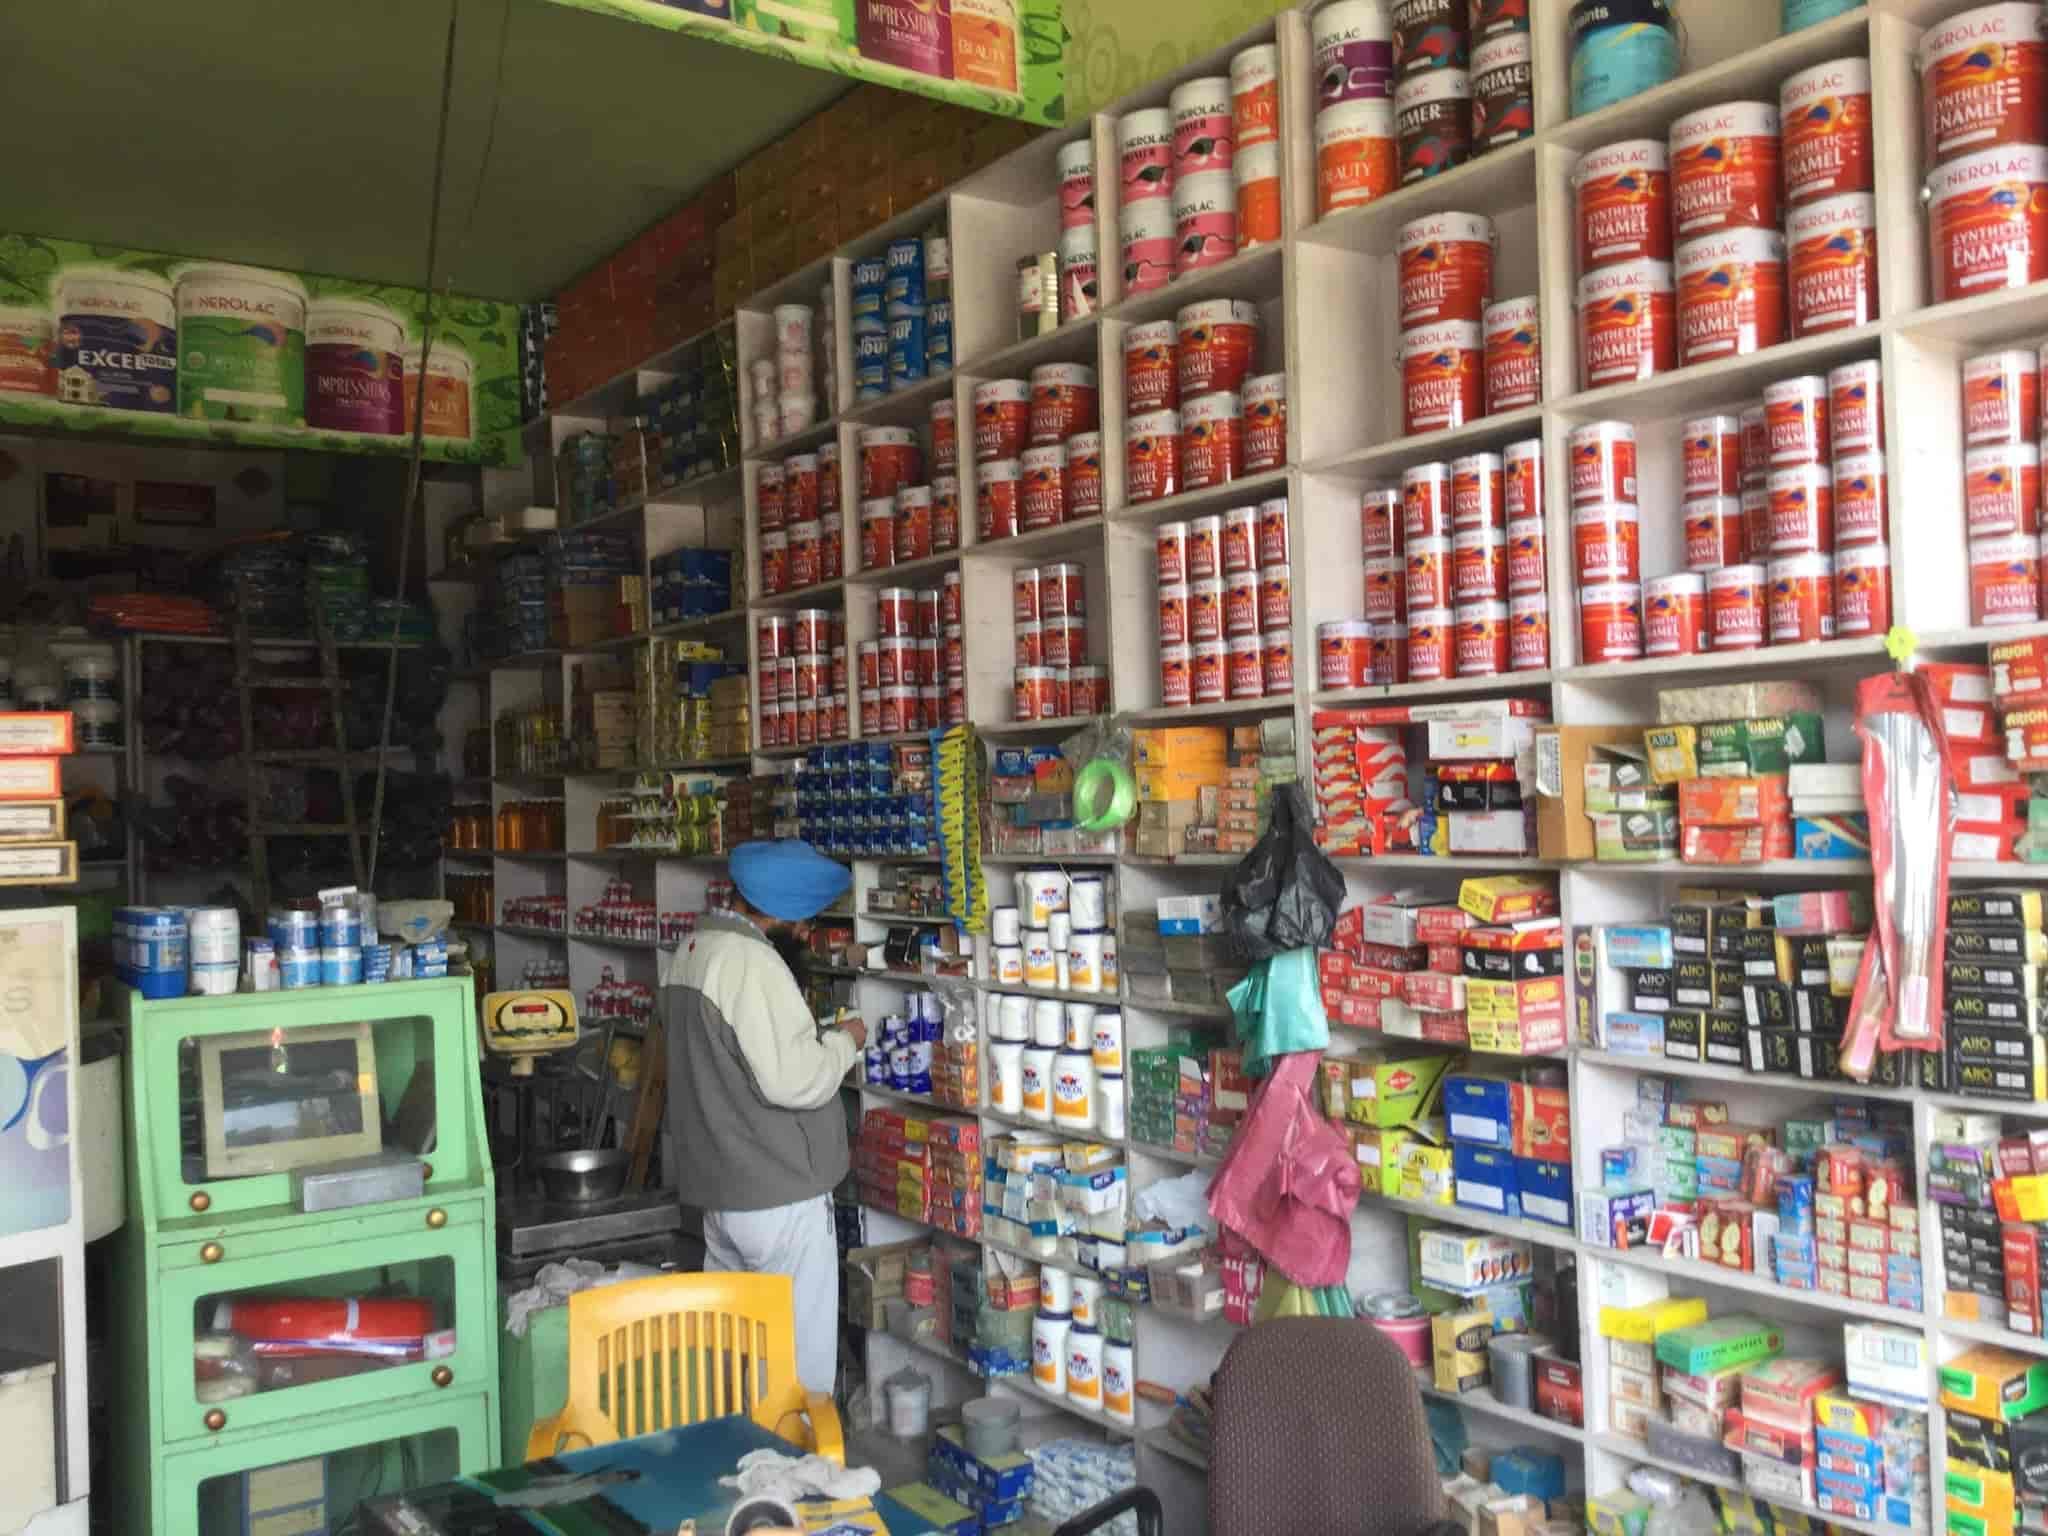 Ubhi Paints And Hardware Store Photos, Jodhan, Ludhiana- Pictures